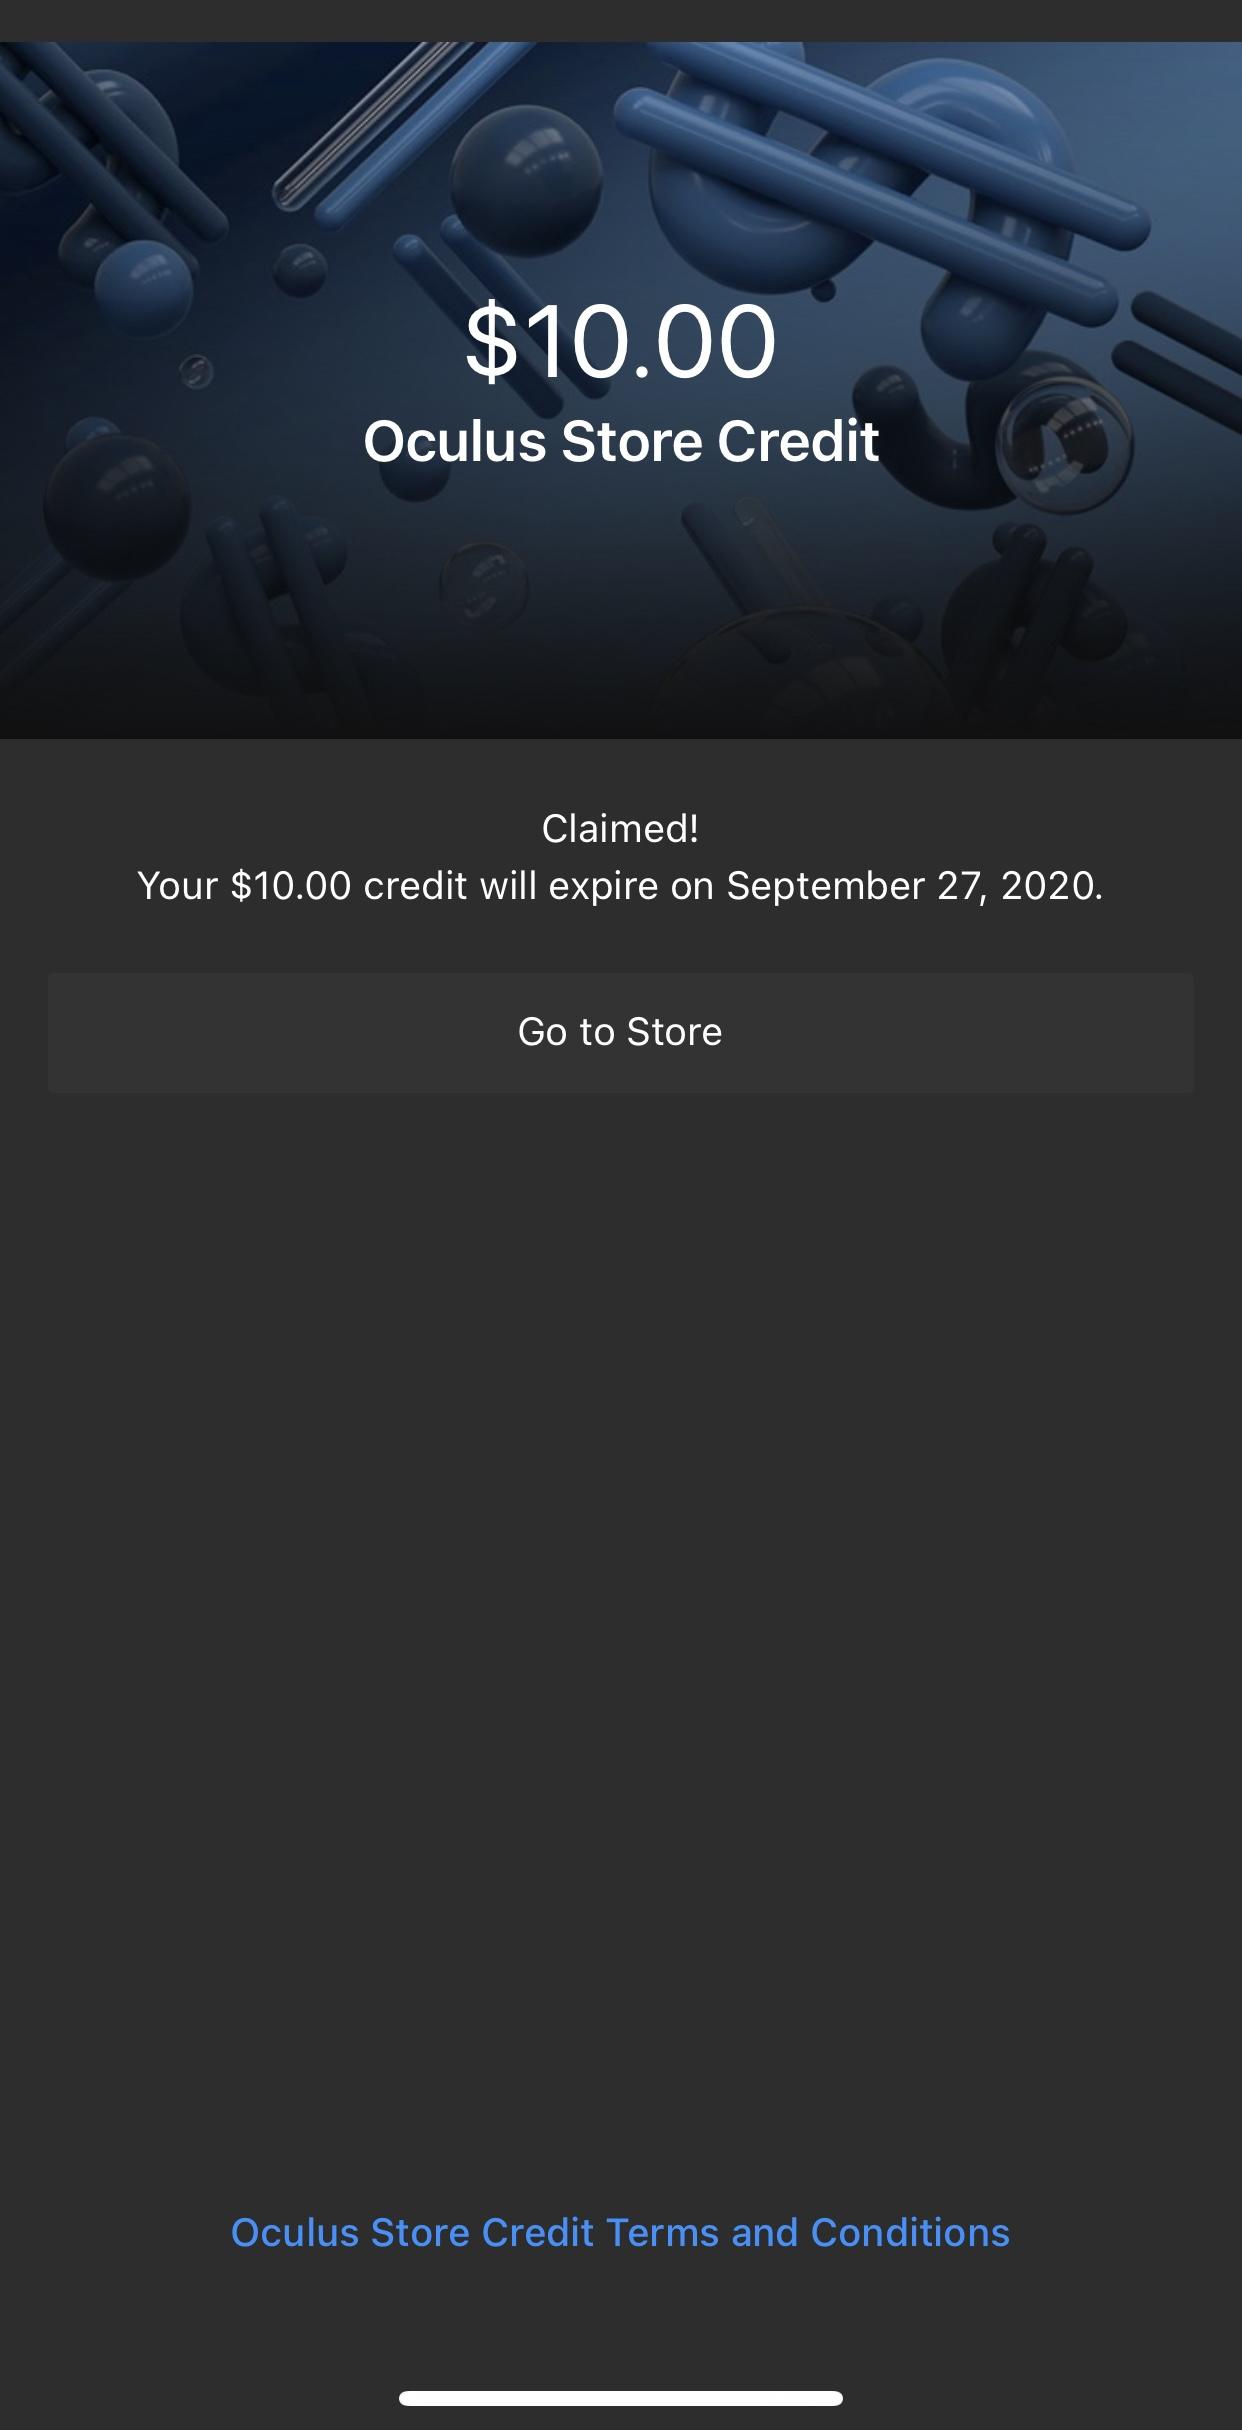 YMMV oculus store $10 credit exp 9/27